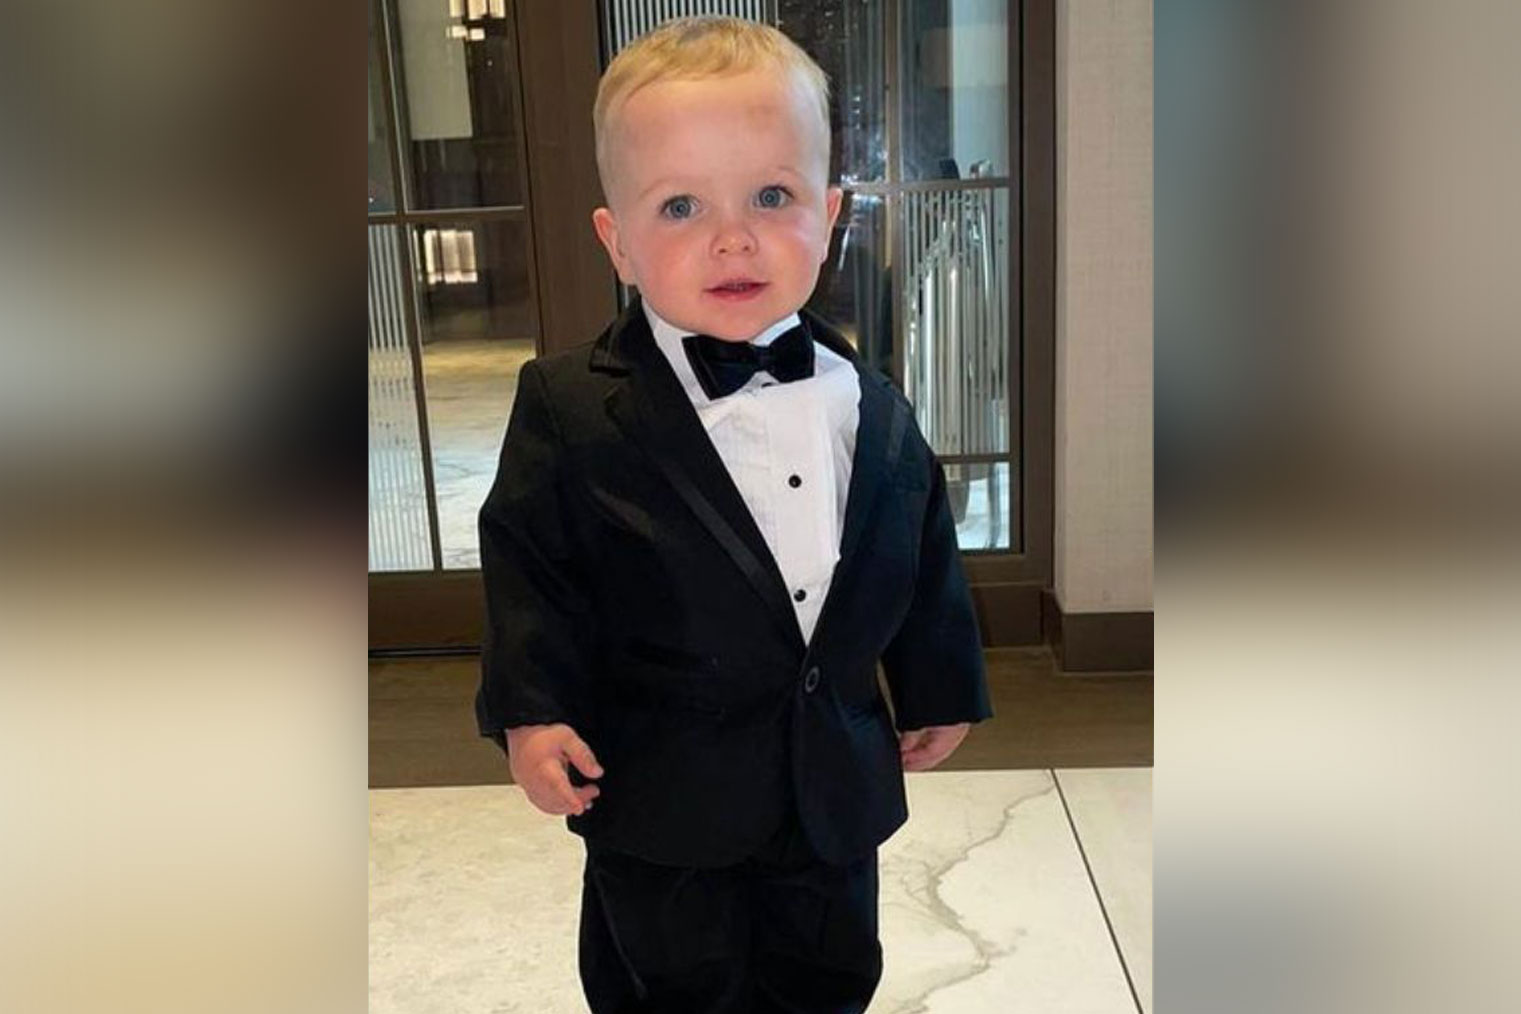 Little Oscar all dressed up